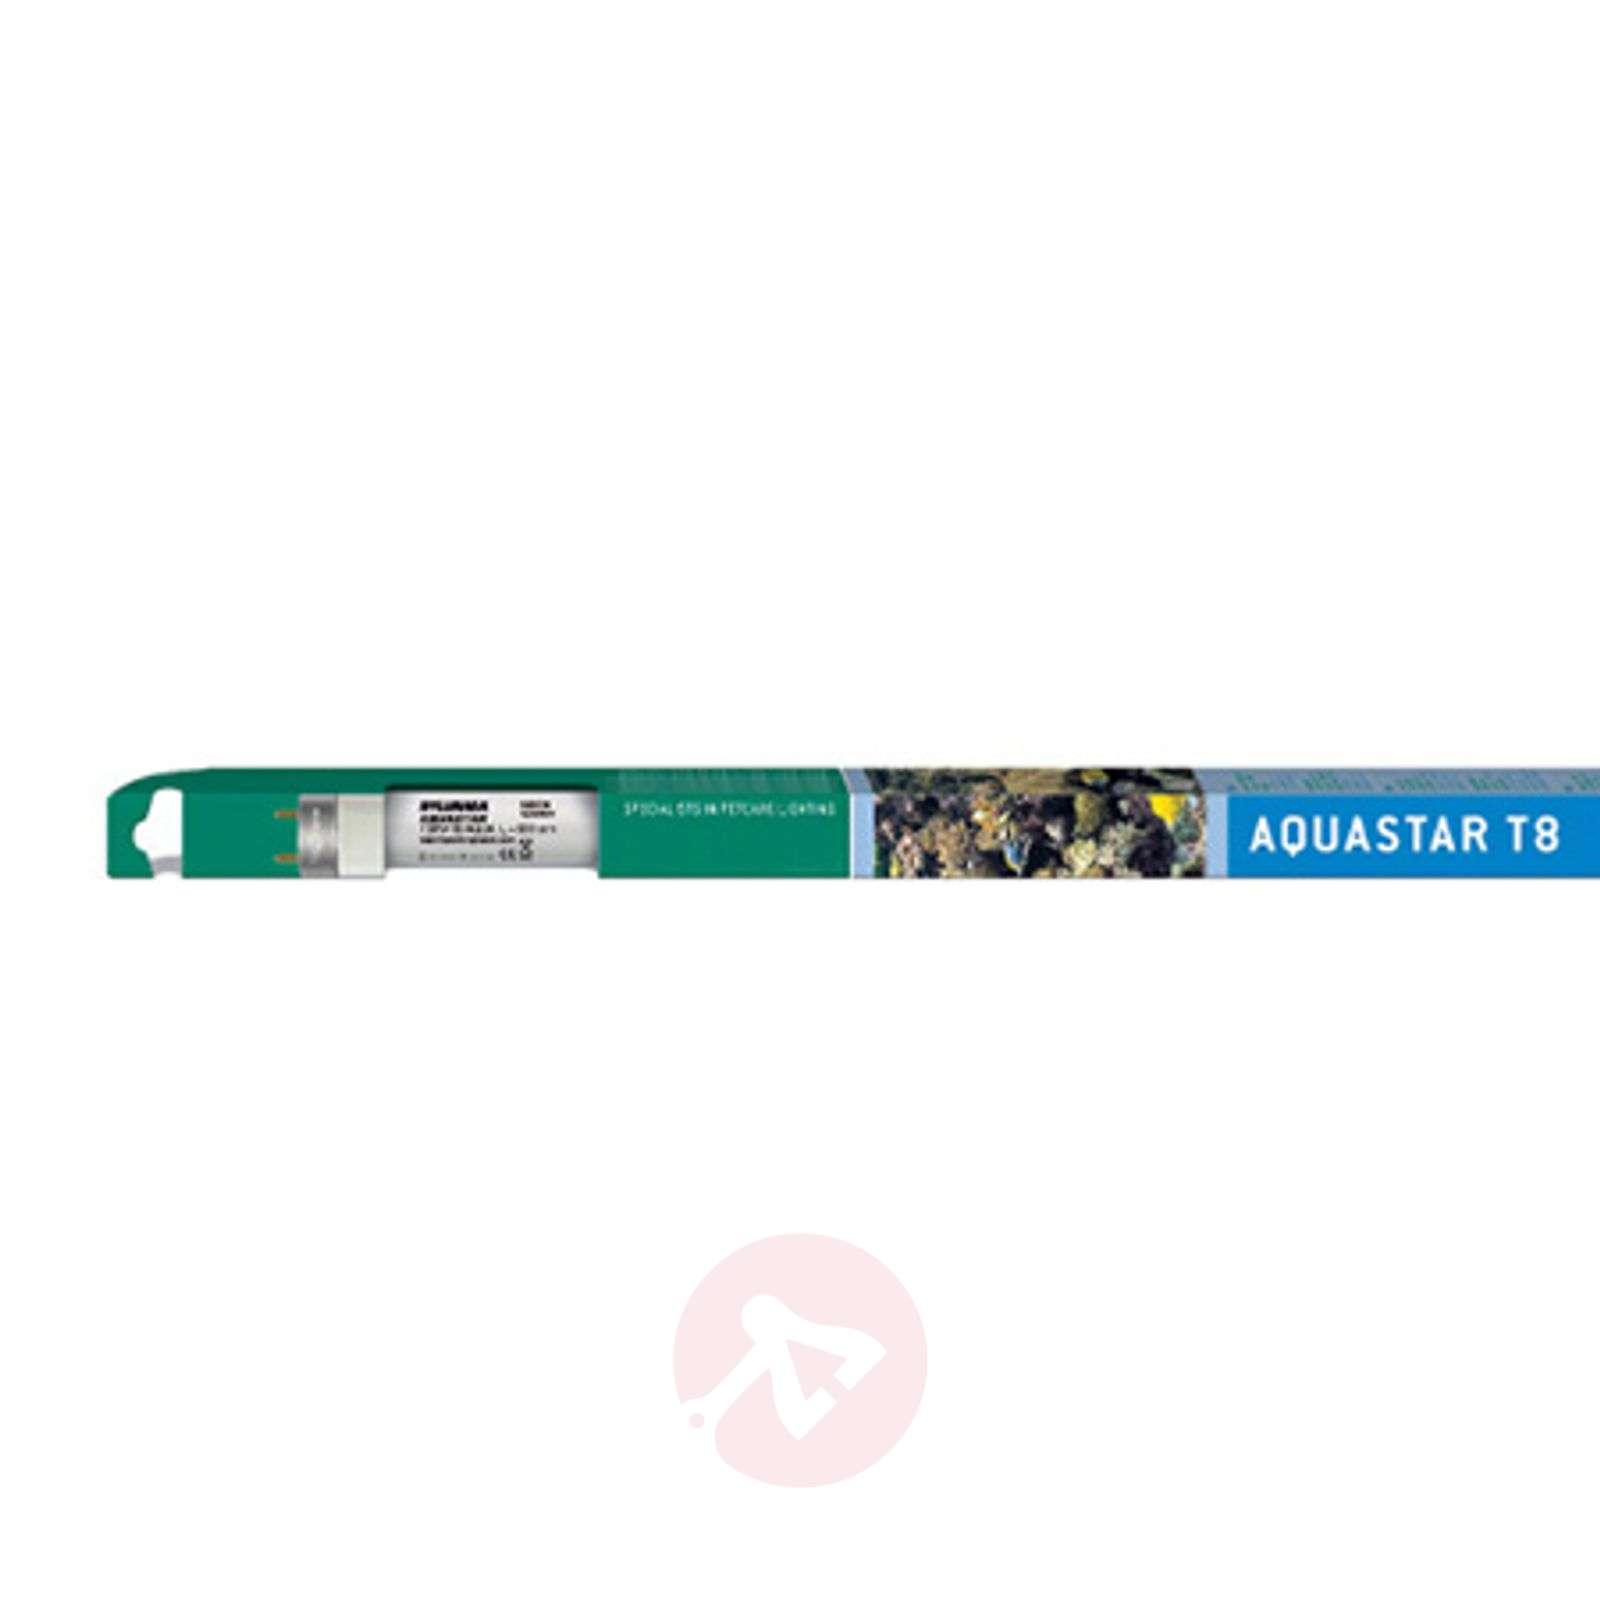 G13 T8 25 W Aquastar-päivänvalolamppu-8530168-03